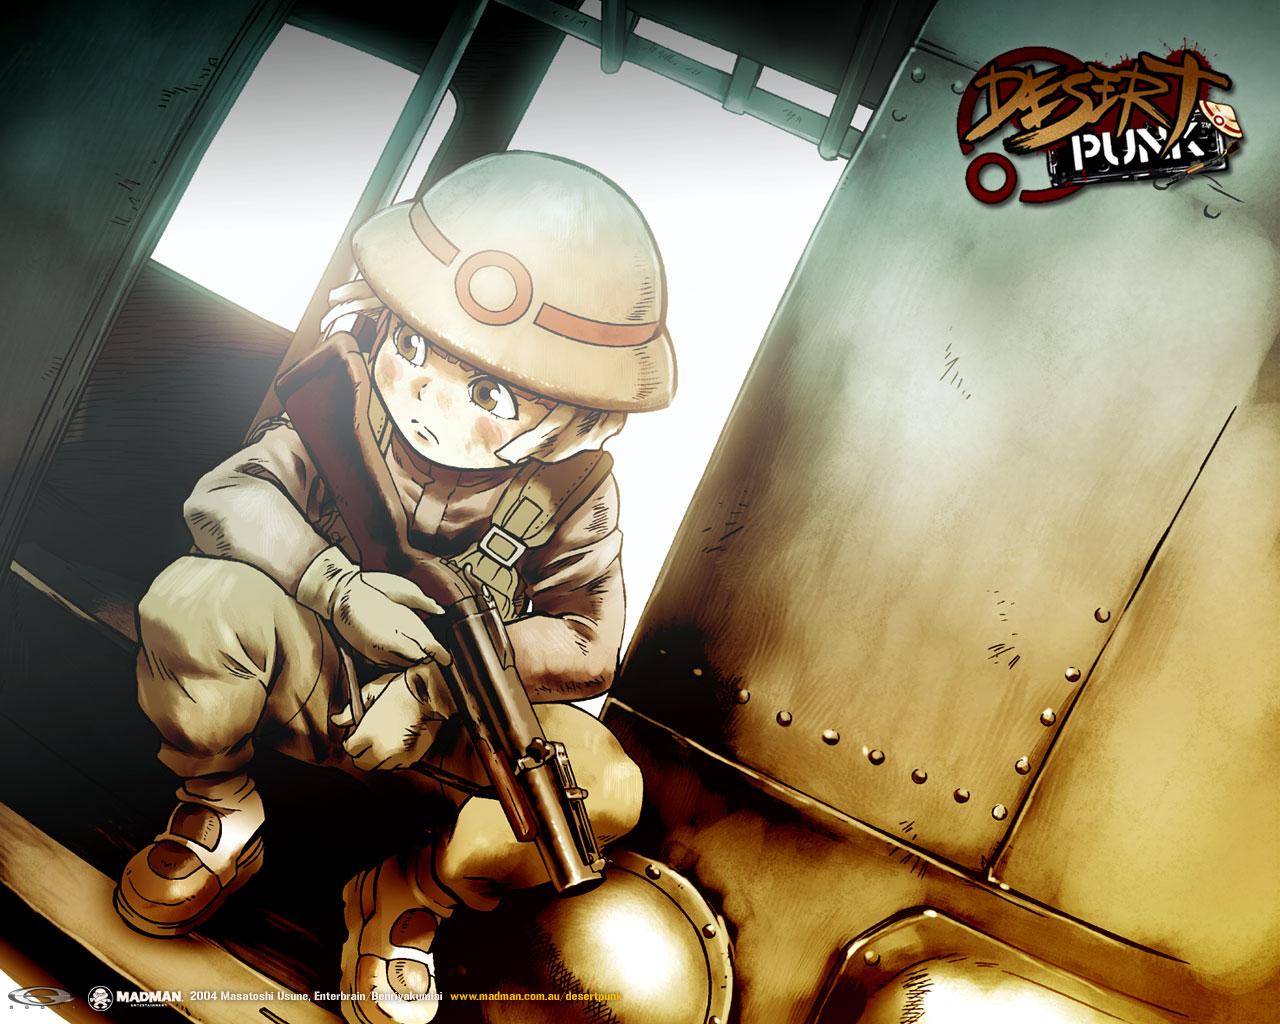 HQ Desert Punk Wallpapers | File 245.64Kb